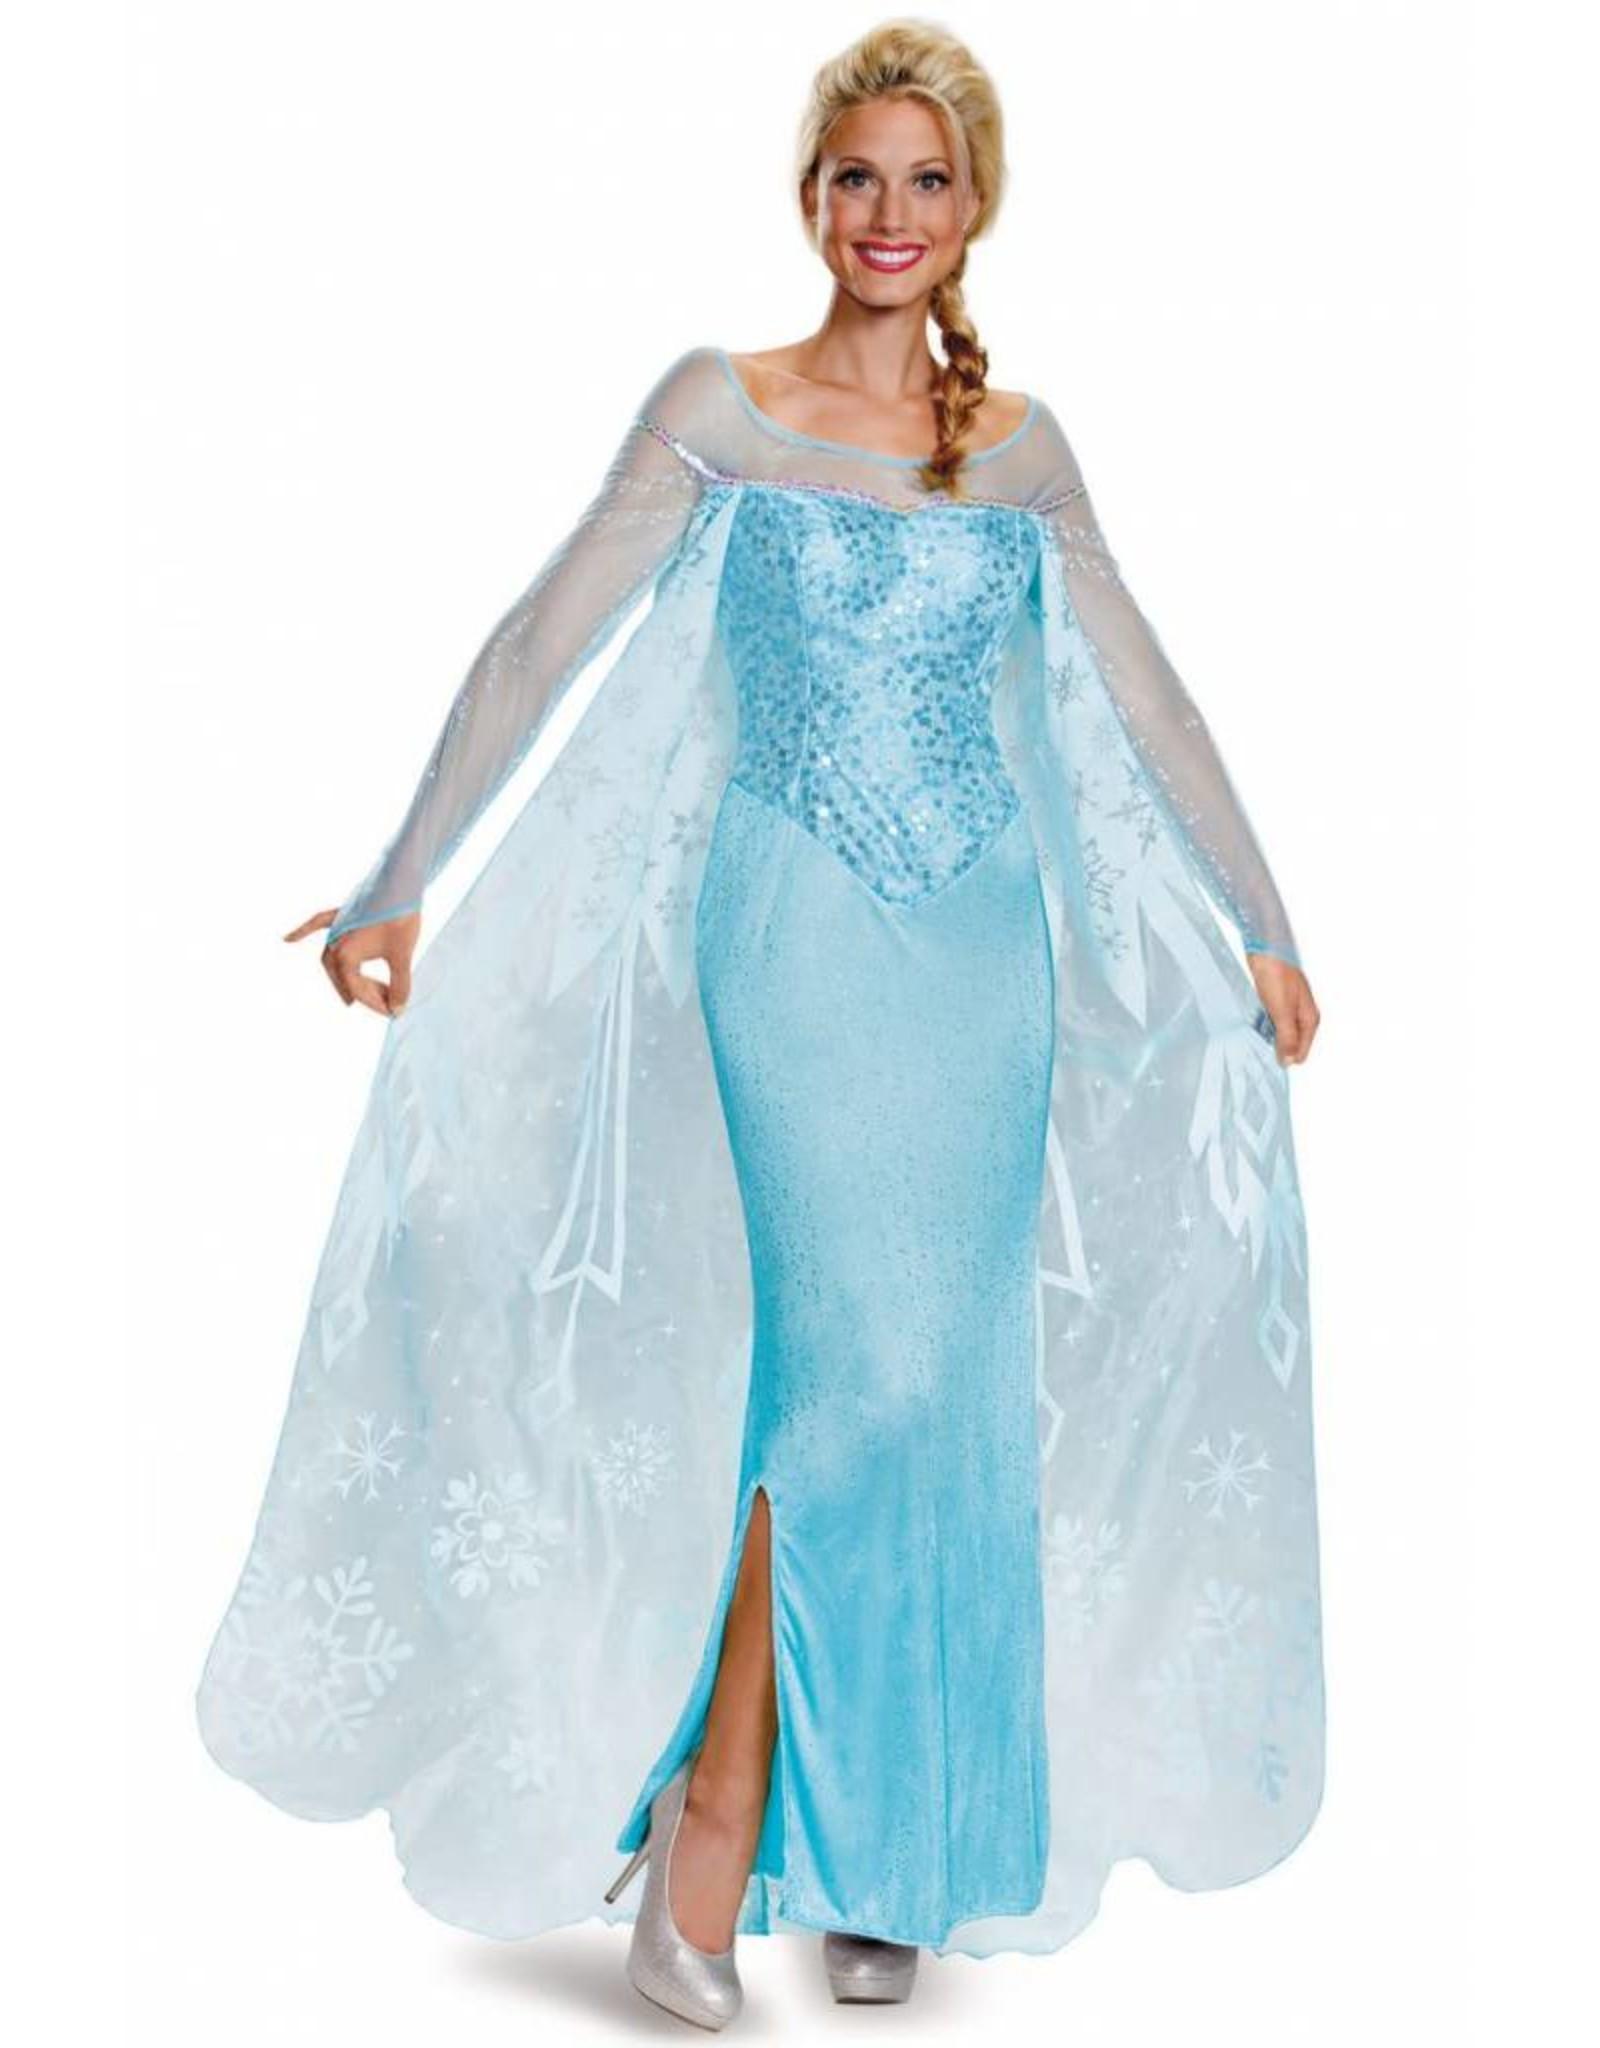 Disguise Elsa Prestige